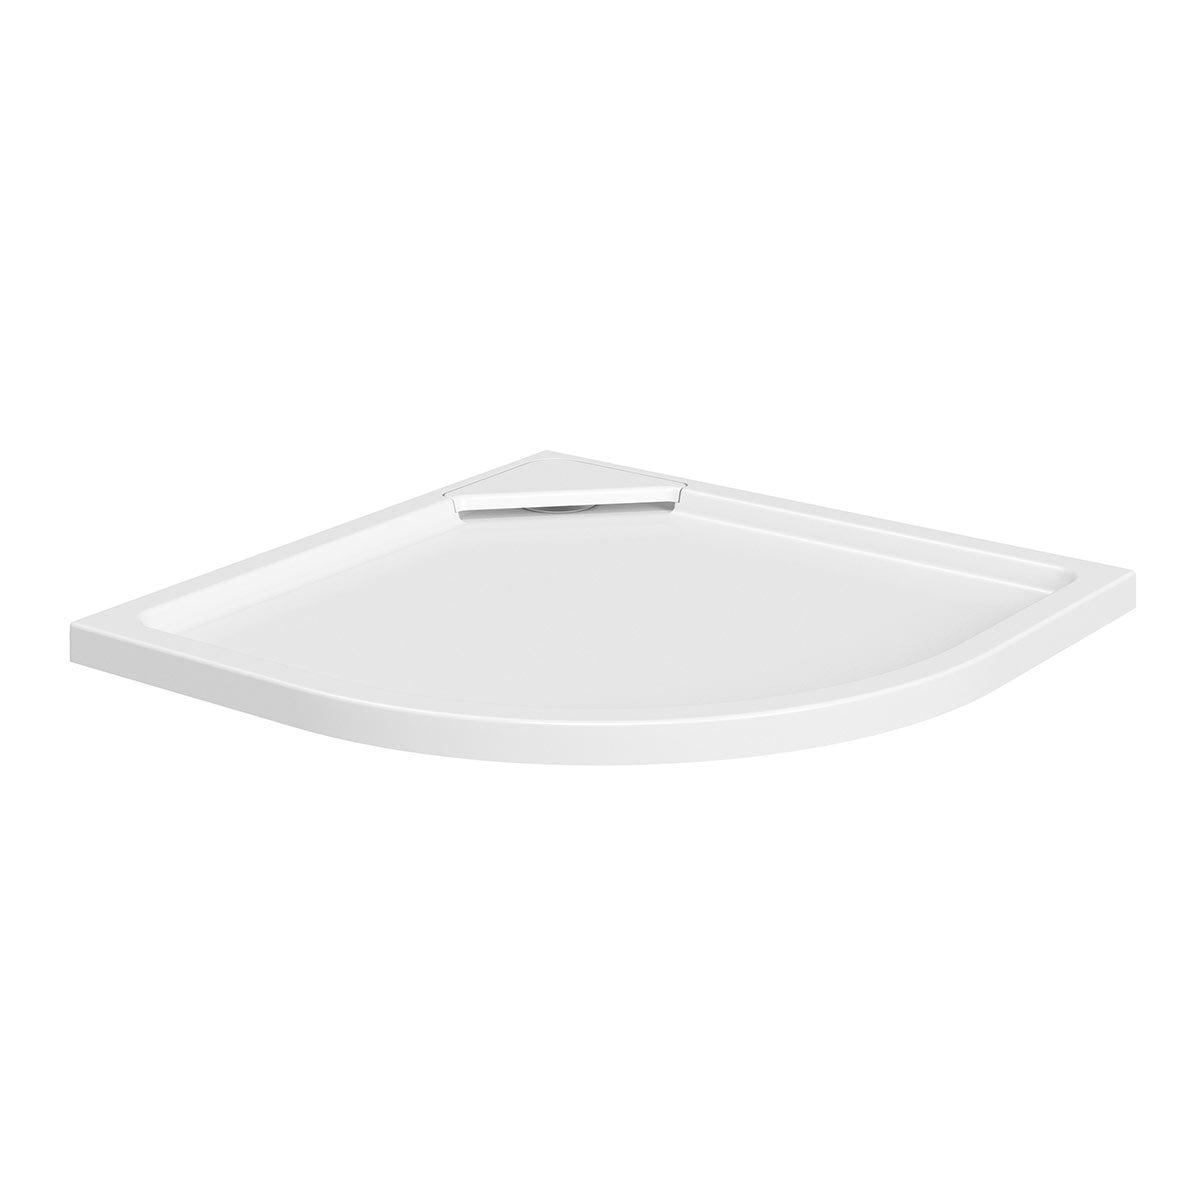 Designer Quadrant Stone Shower Tray